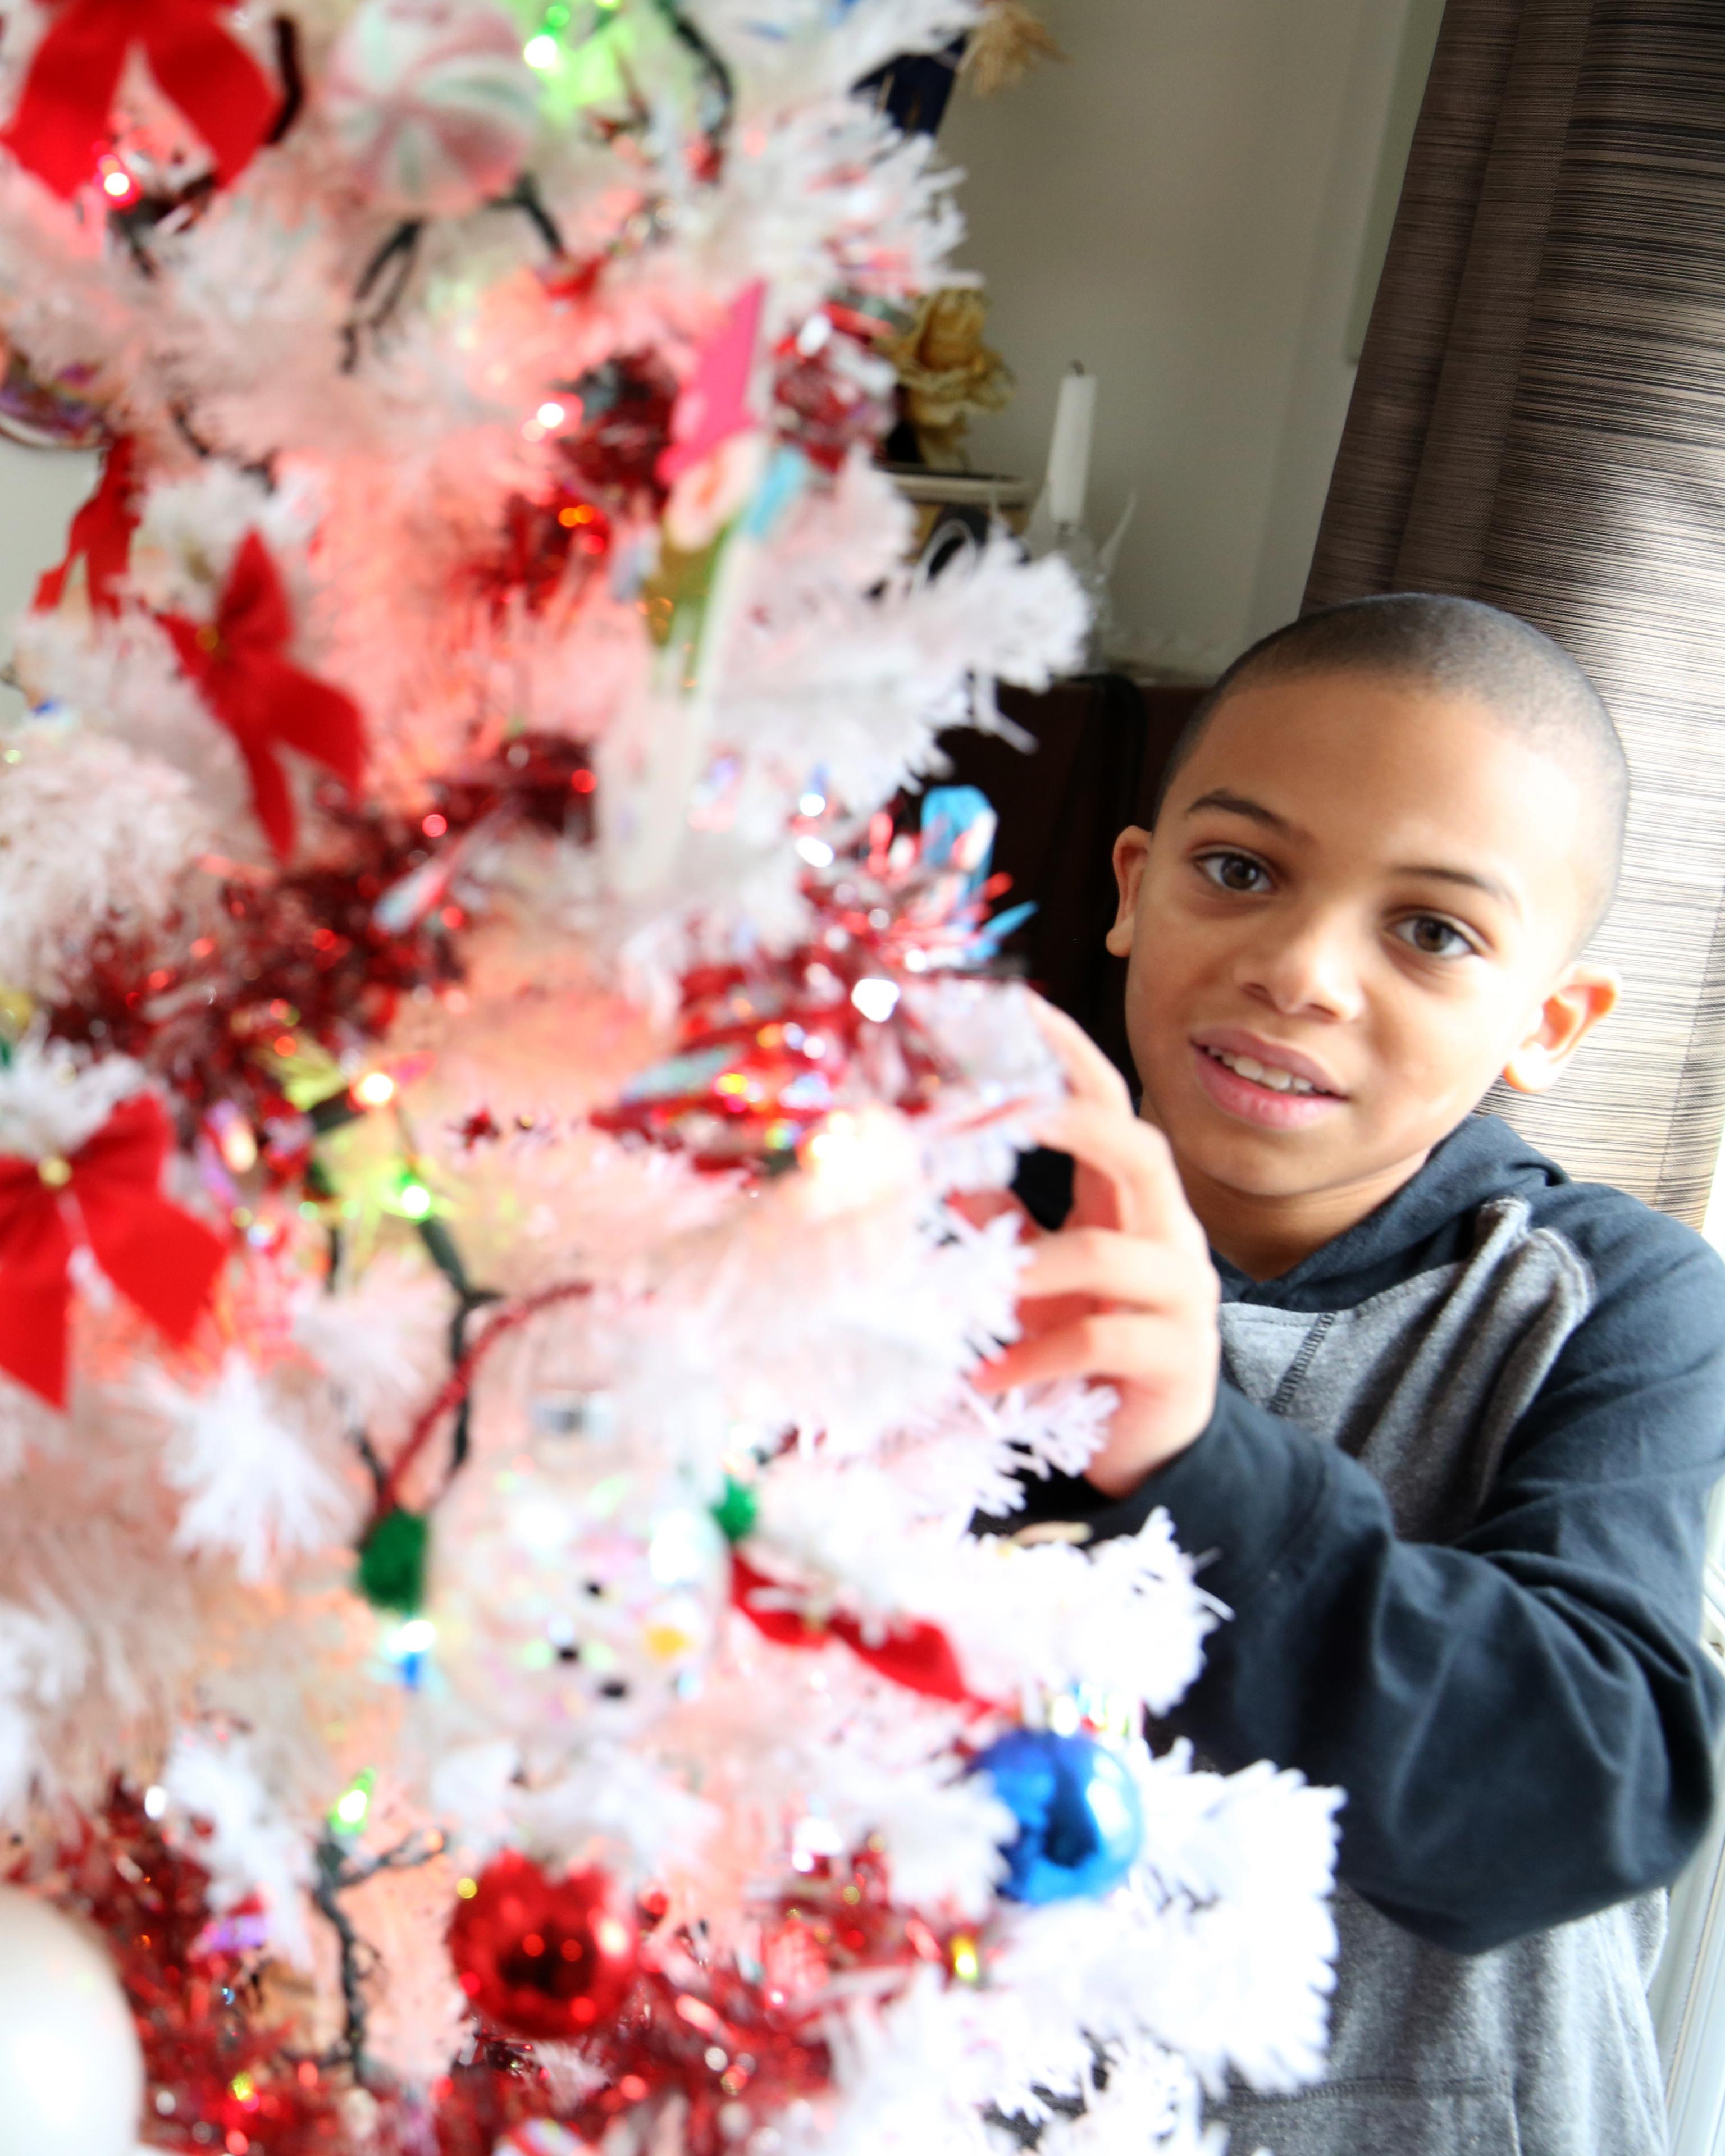 Kids Christmas FY5A9576 - Selfless Elf